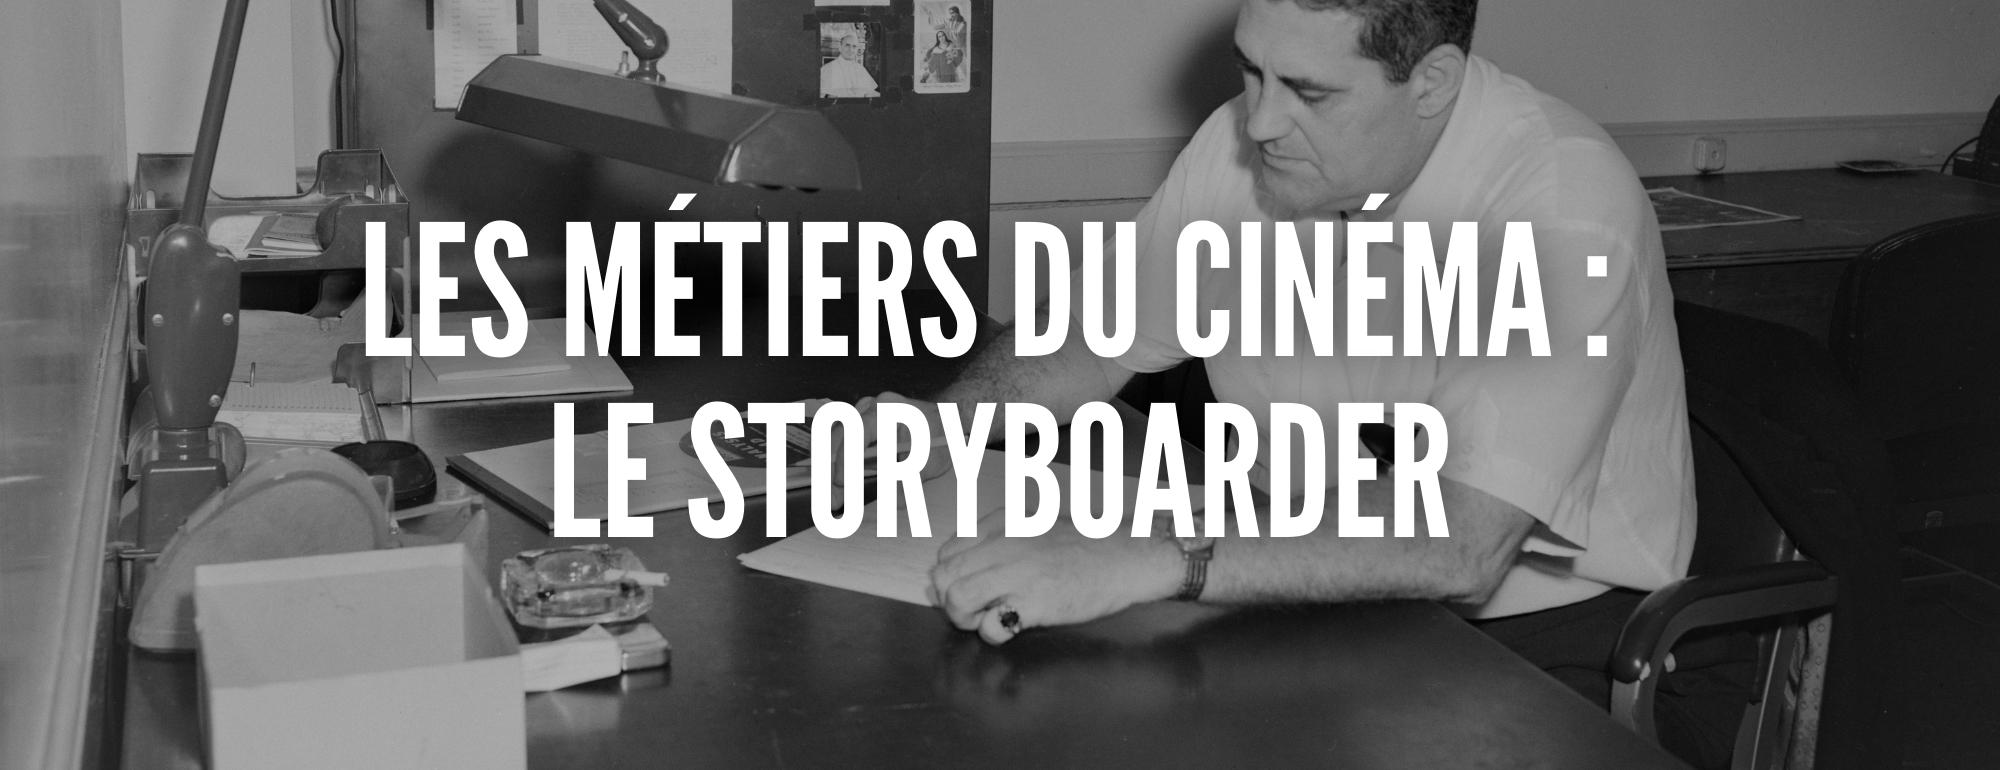 metier storyboarder